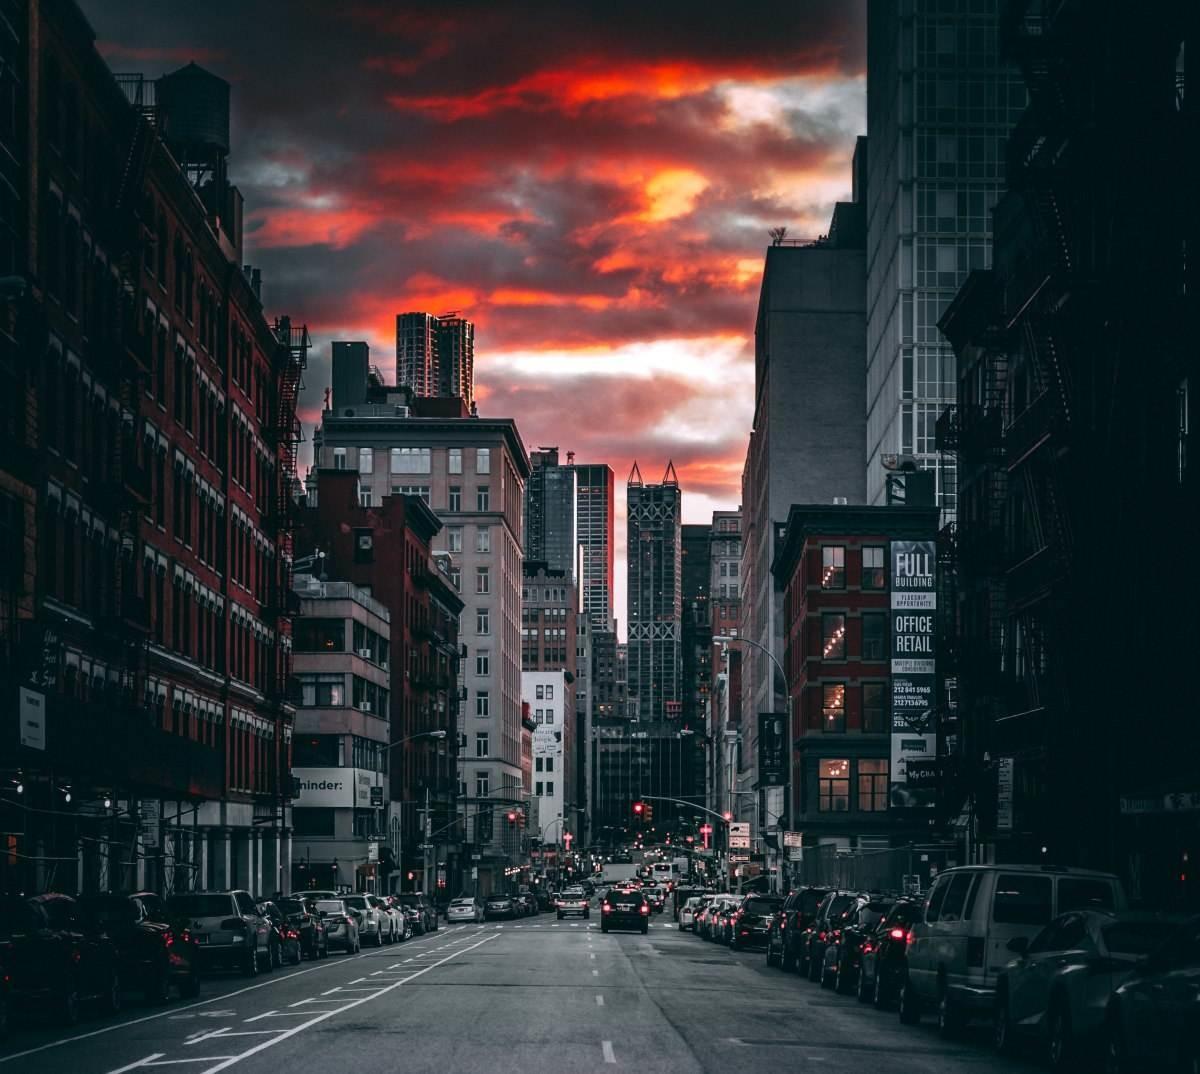 heat island effect in a city